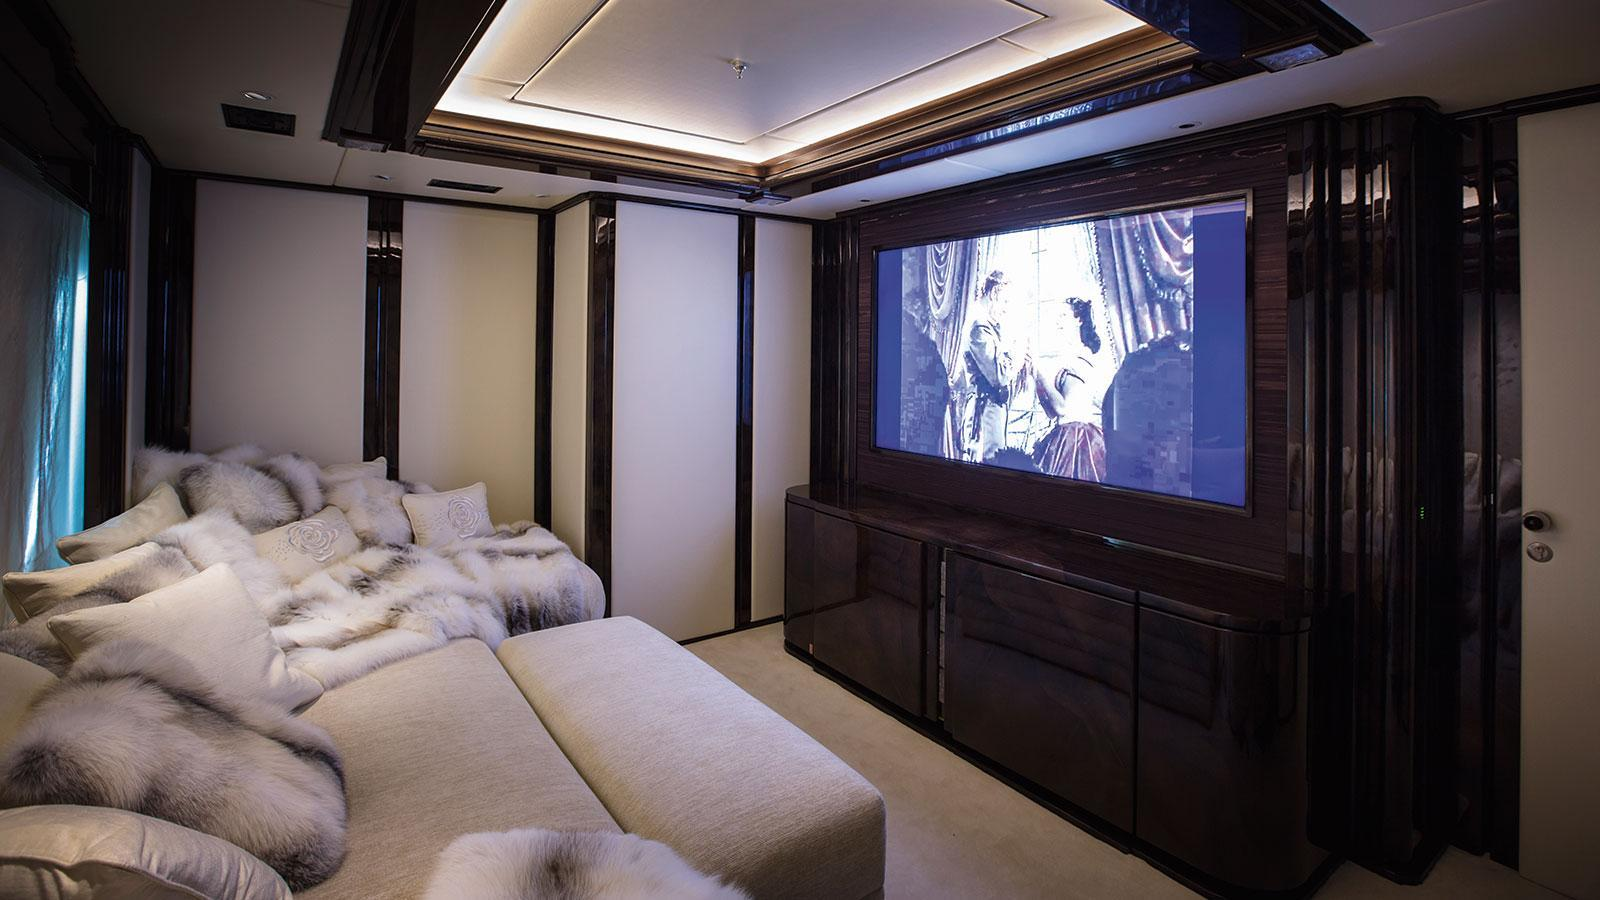 illusion-v-motor-yacht-benetti-2014-58m-cinema